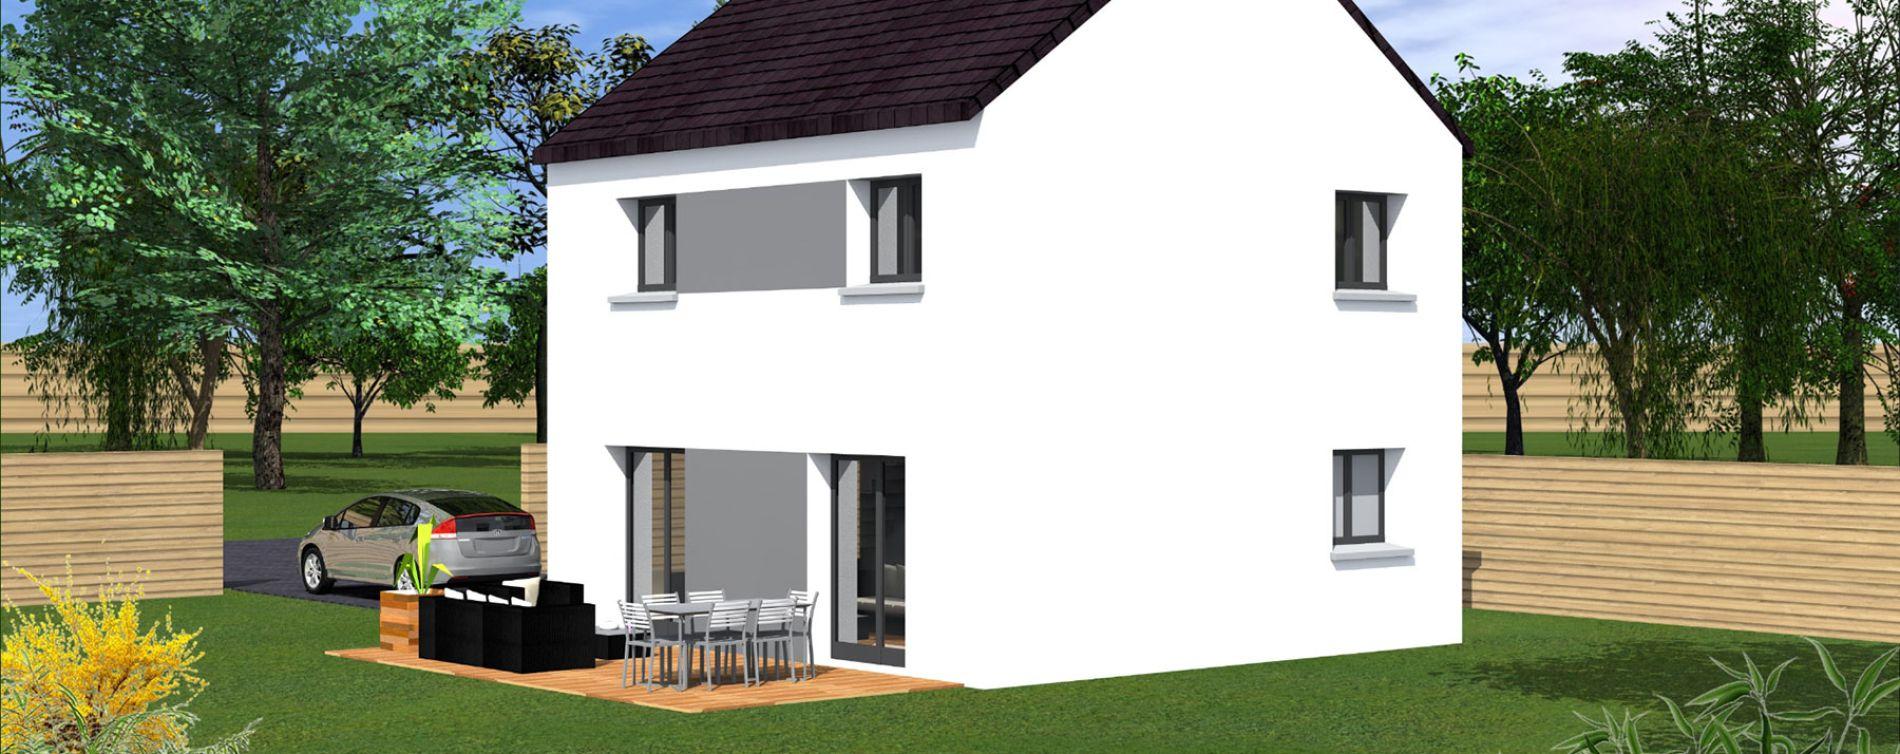 Brest : programme immobilier neuve « Loscoat » (2)